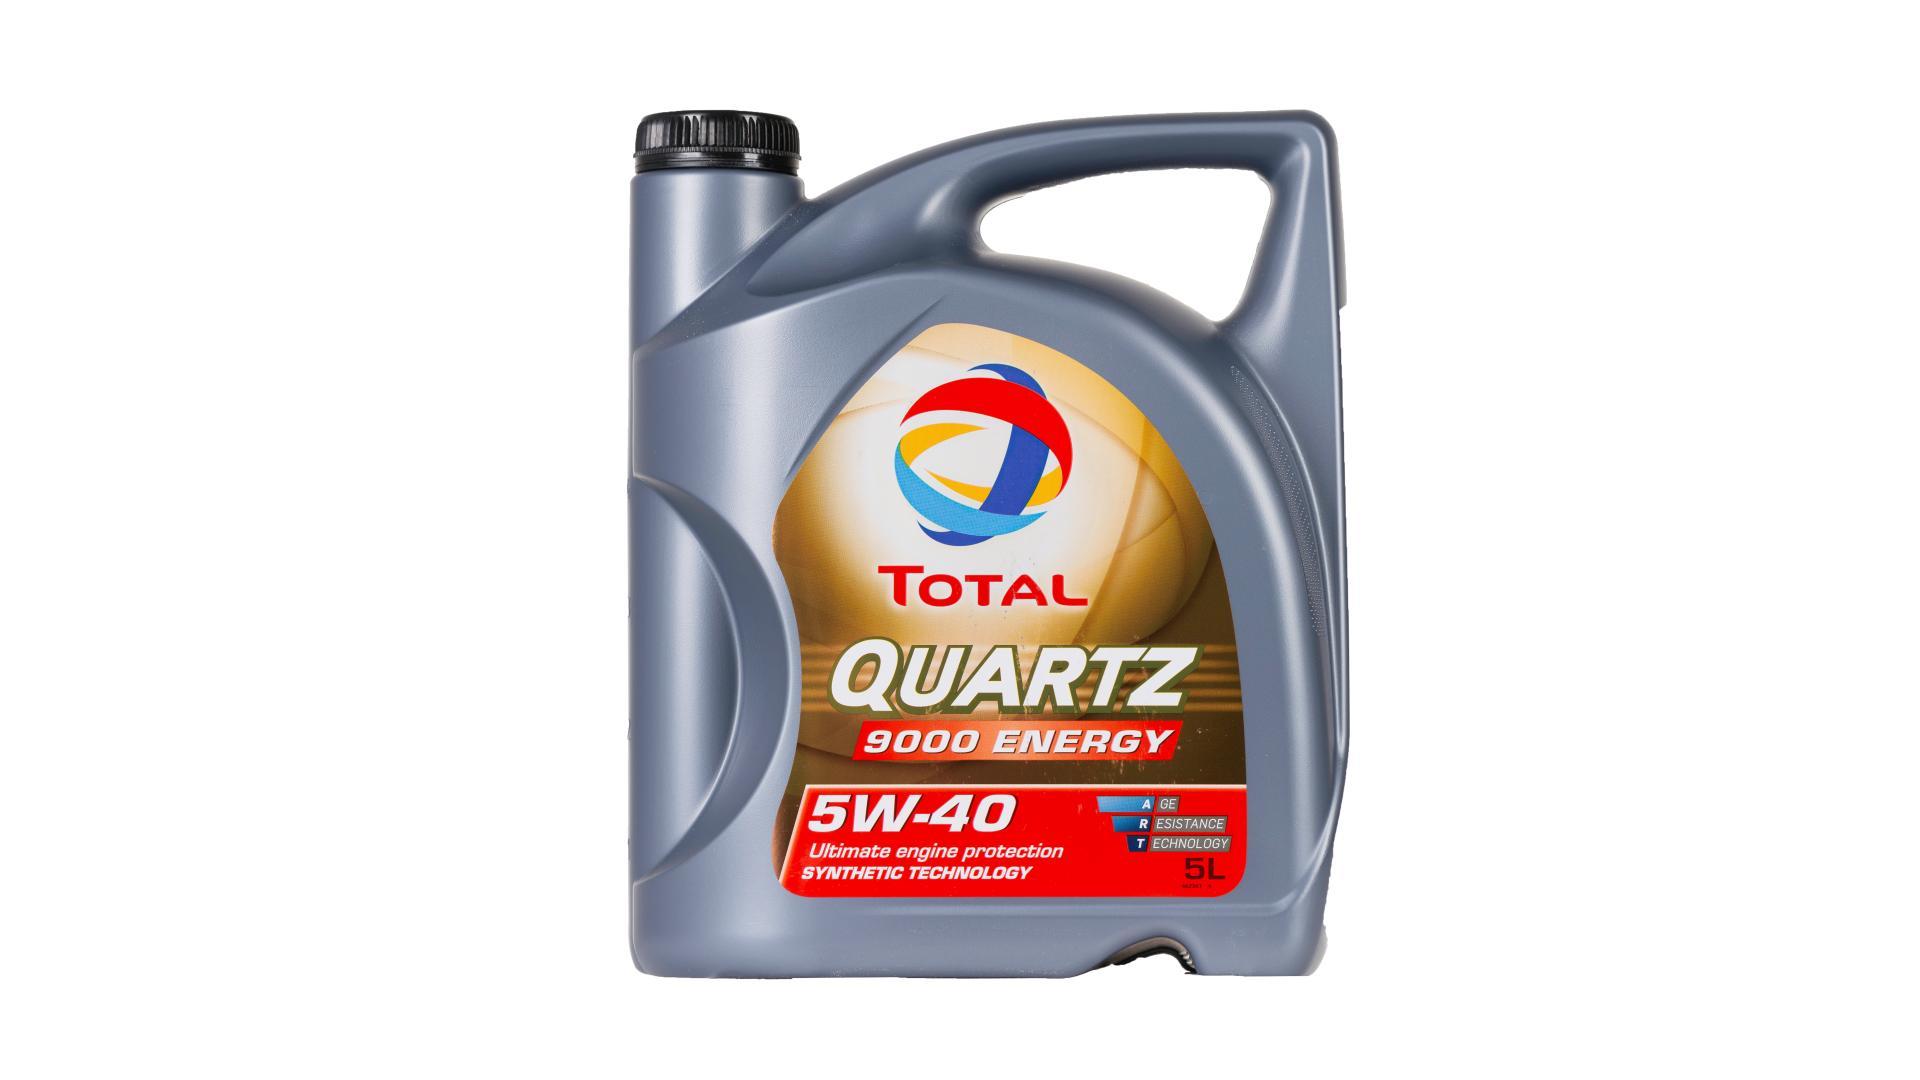 Total 5w-40 Energy 9000 5L (156812) (174189)